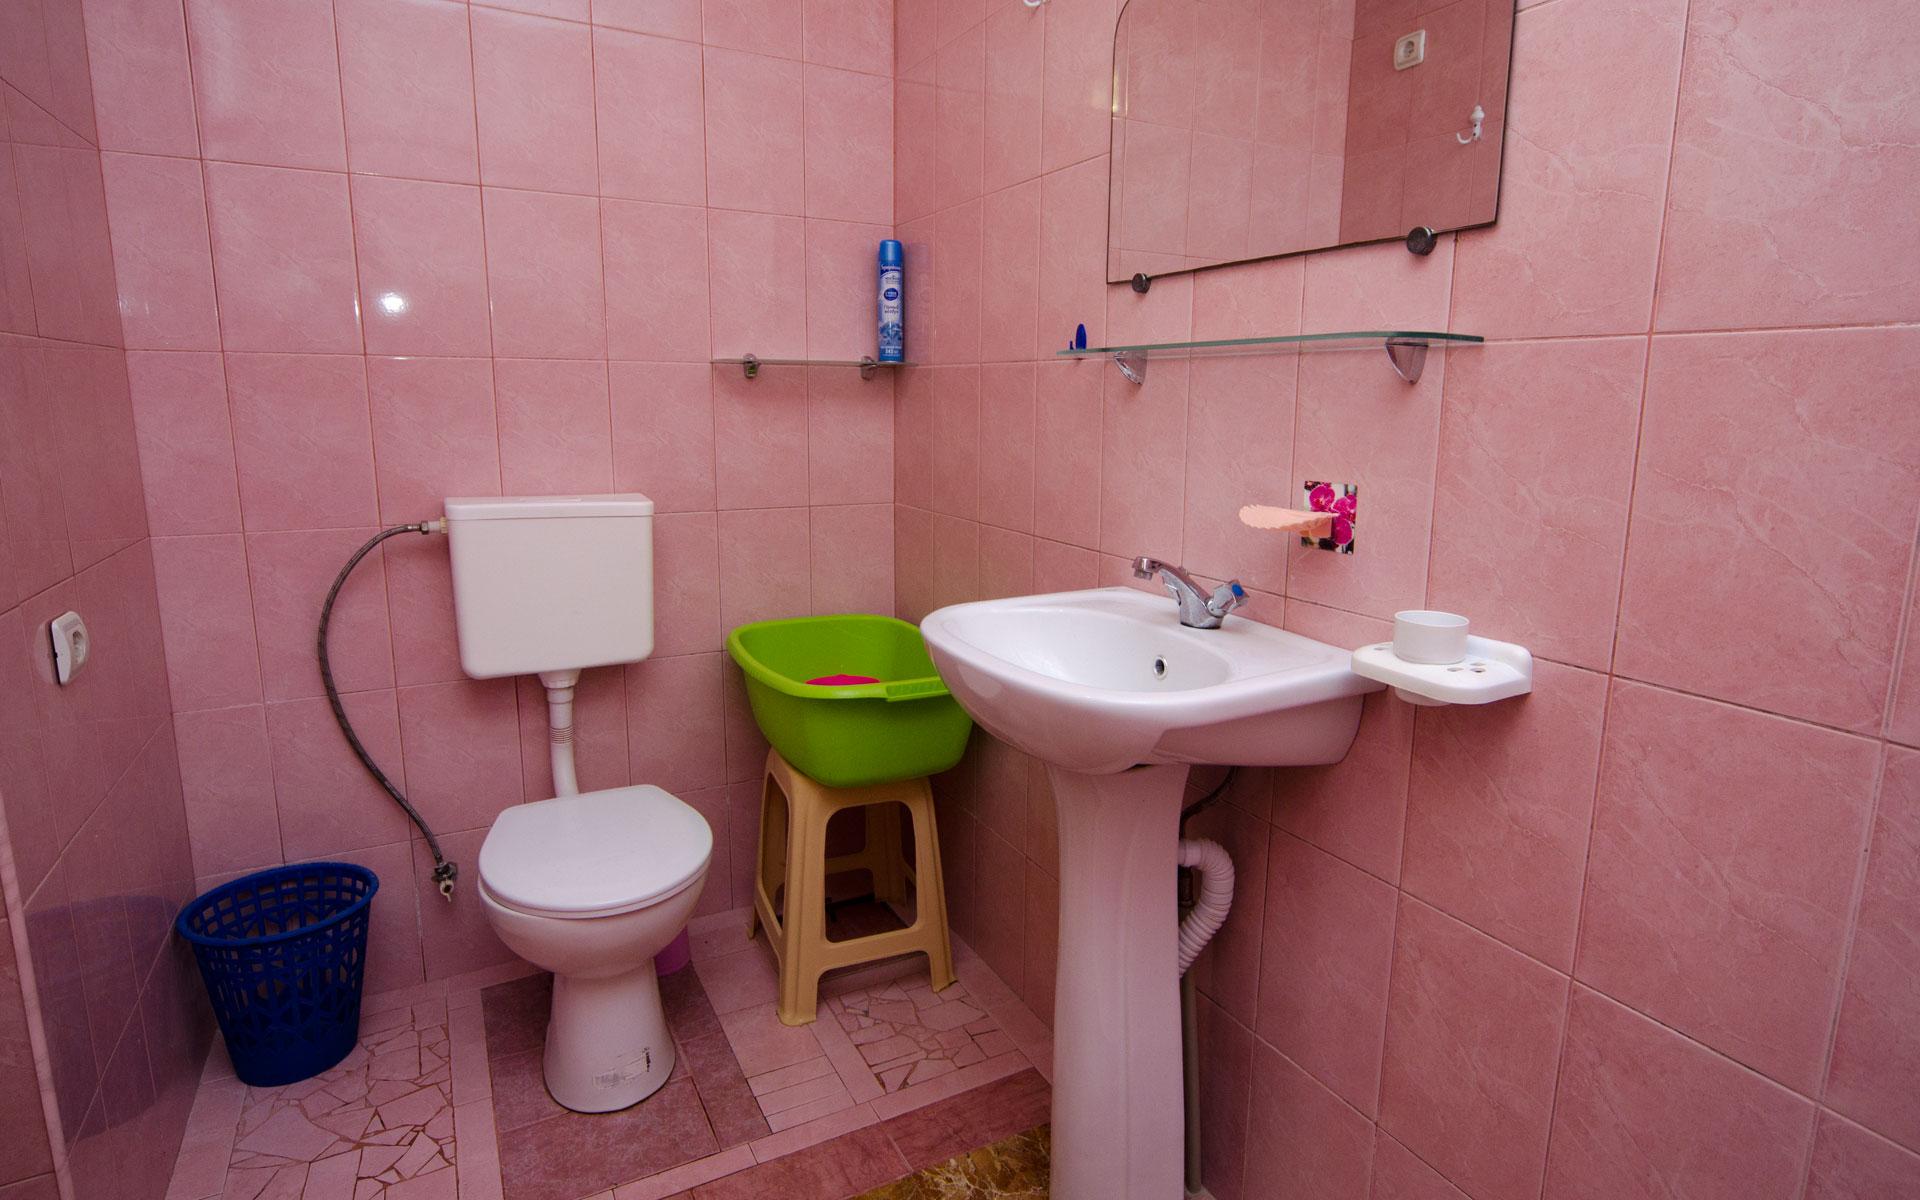 Душ, туалет. Квартира 2. 2 квартиры на ул. Гайдара. Заозёрное